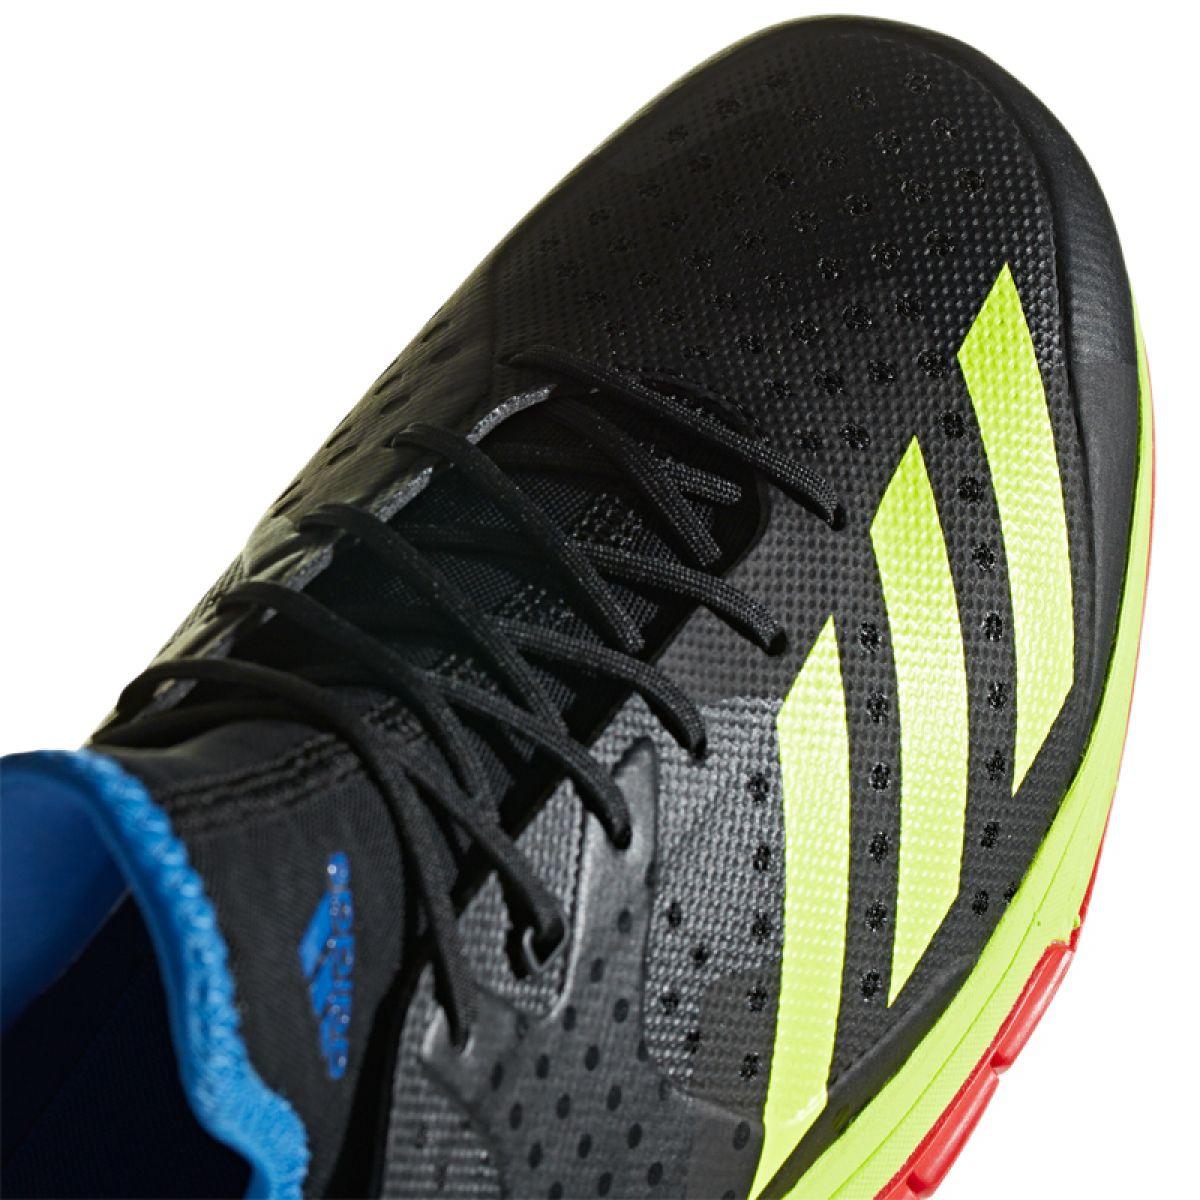 temperamento tapa radio  Adidas Counterblast Bounce M BD7408 handball shoes black multicolored -  ButyModne.pl